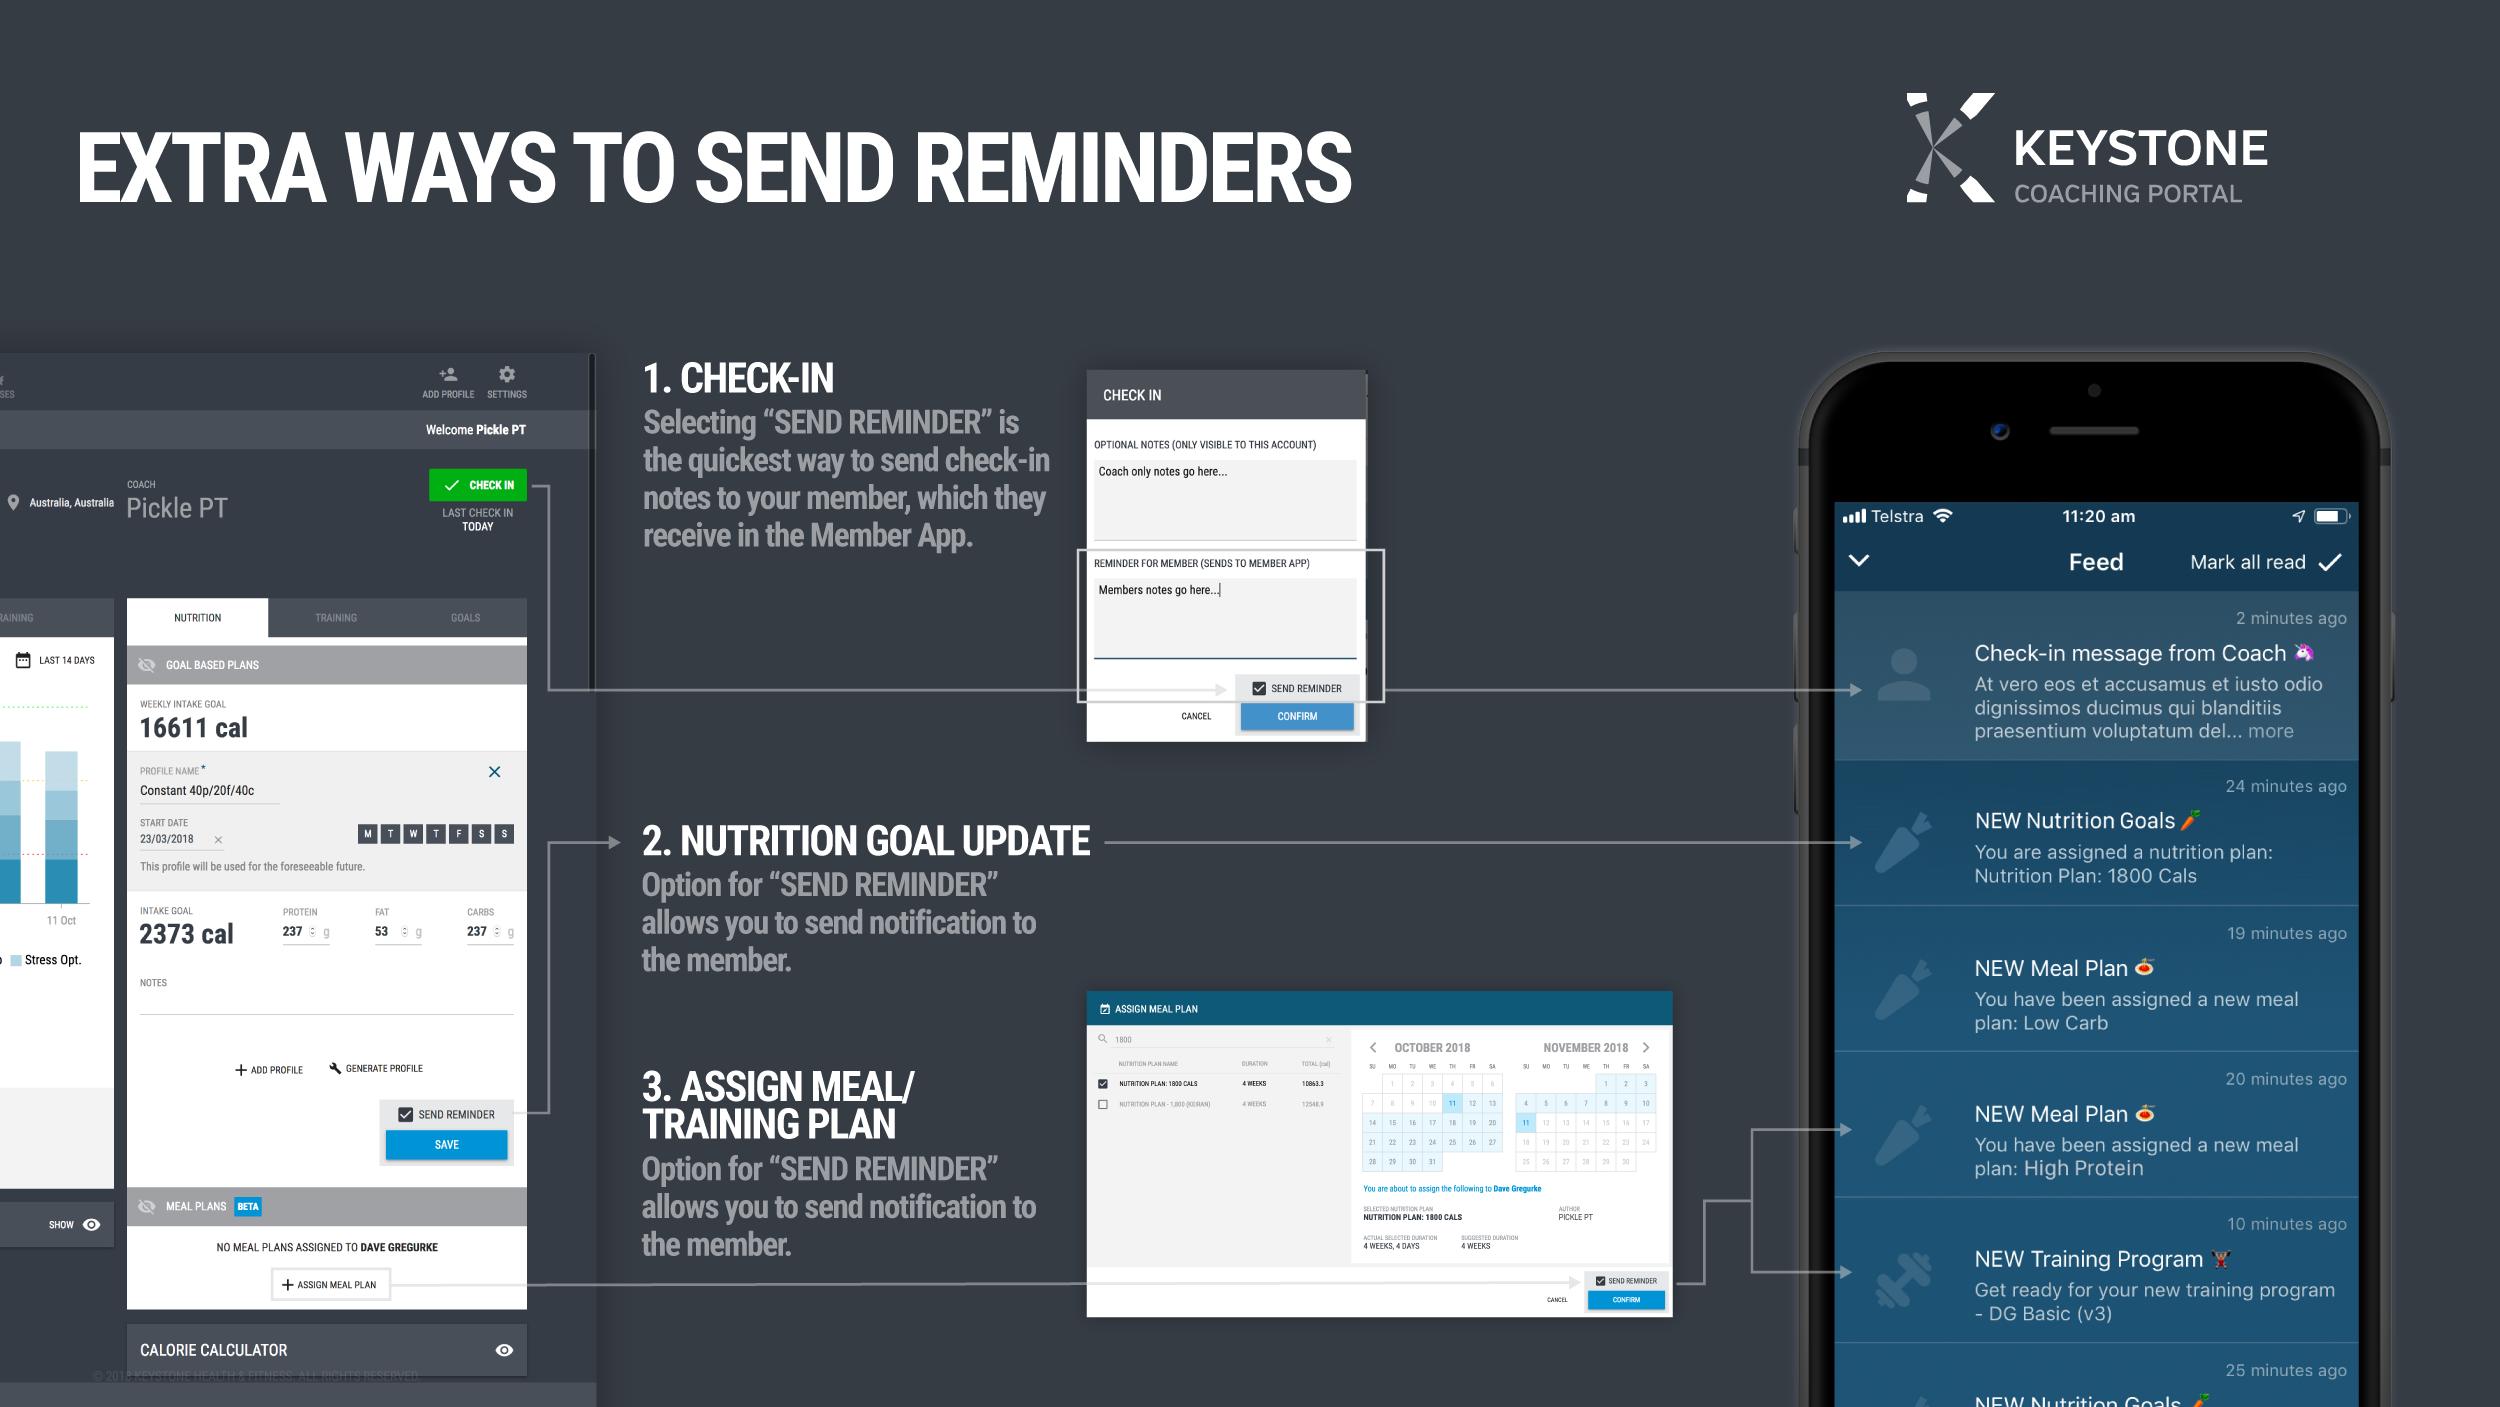 k_Tute_Portal_Reminders2_L_1.png